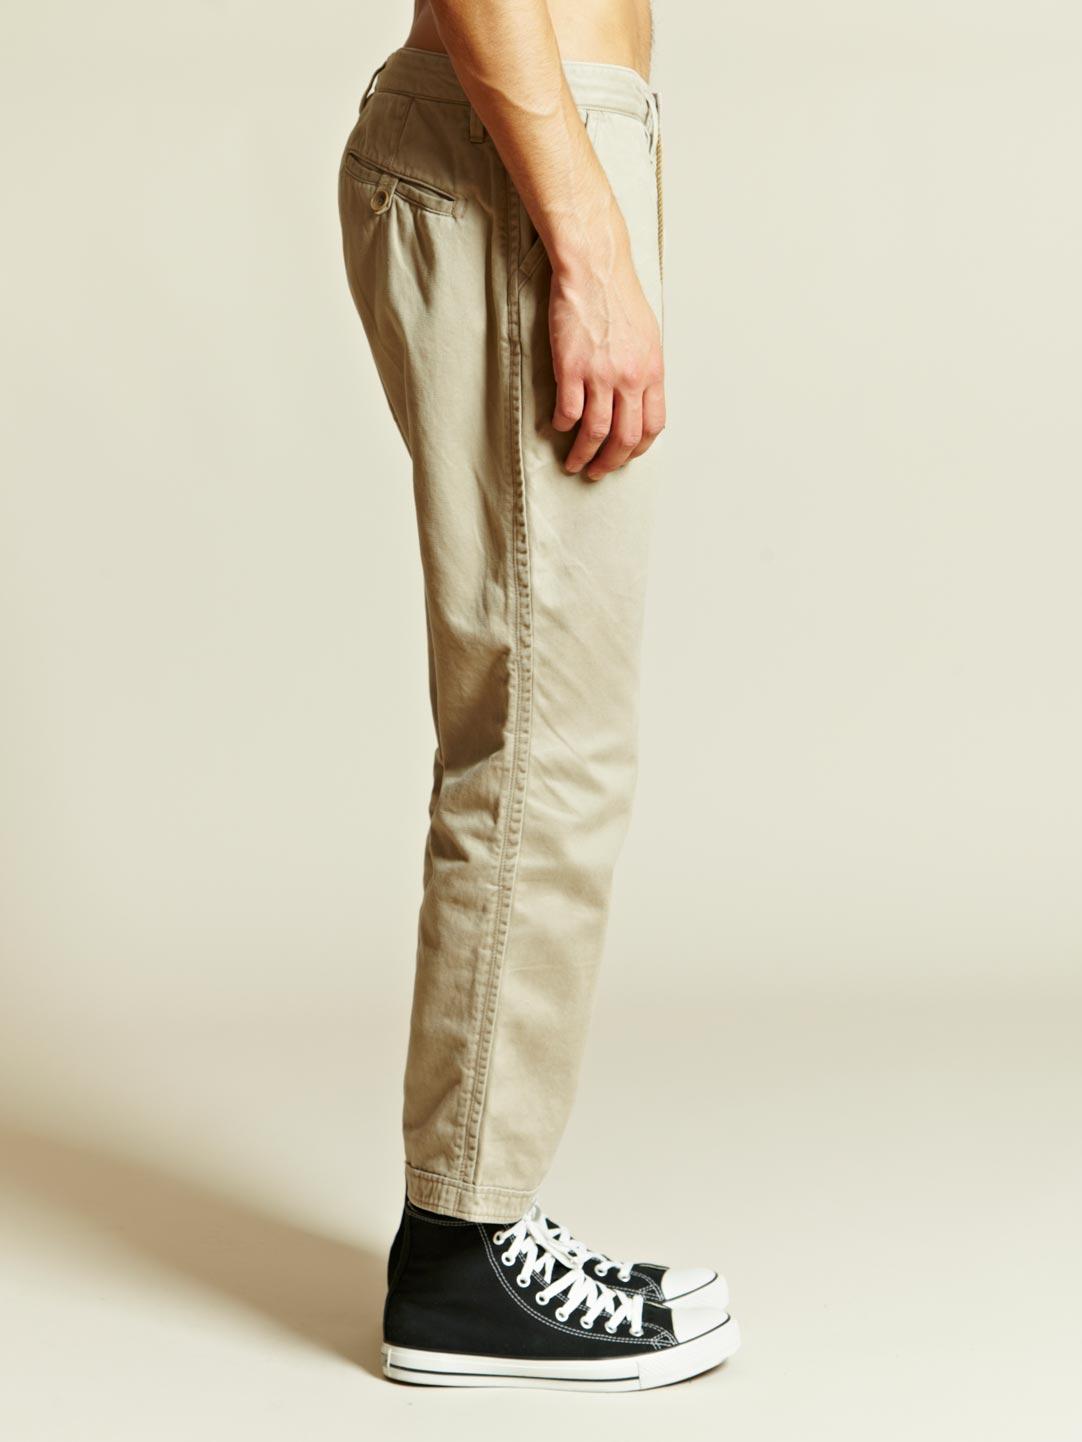 Nonnative Nonnative Mens Dweller Ankle Cut Pants In Natural For Men | Lyst